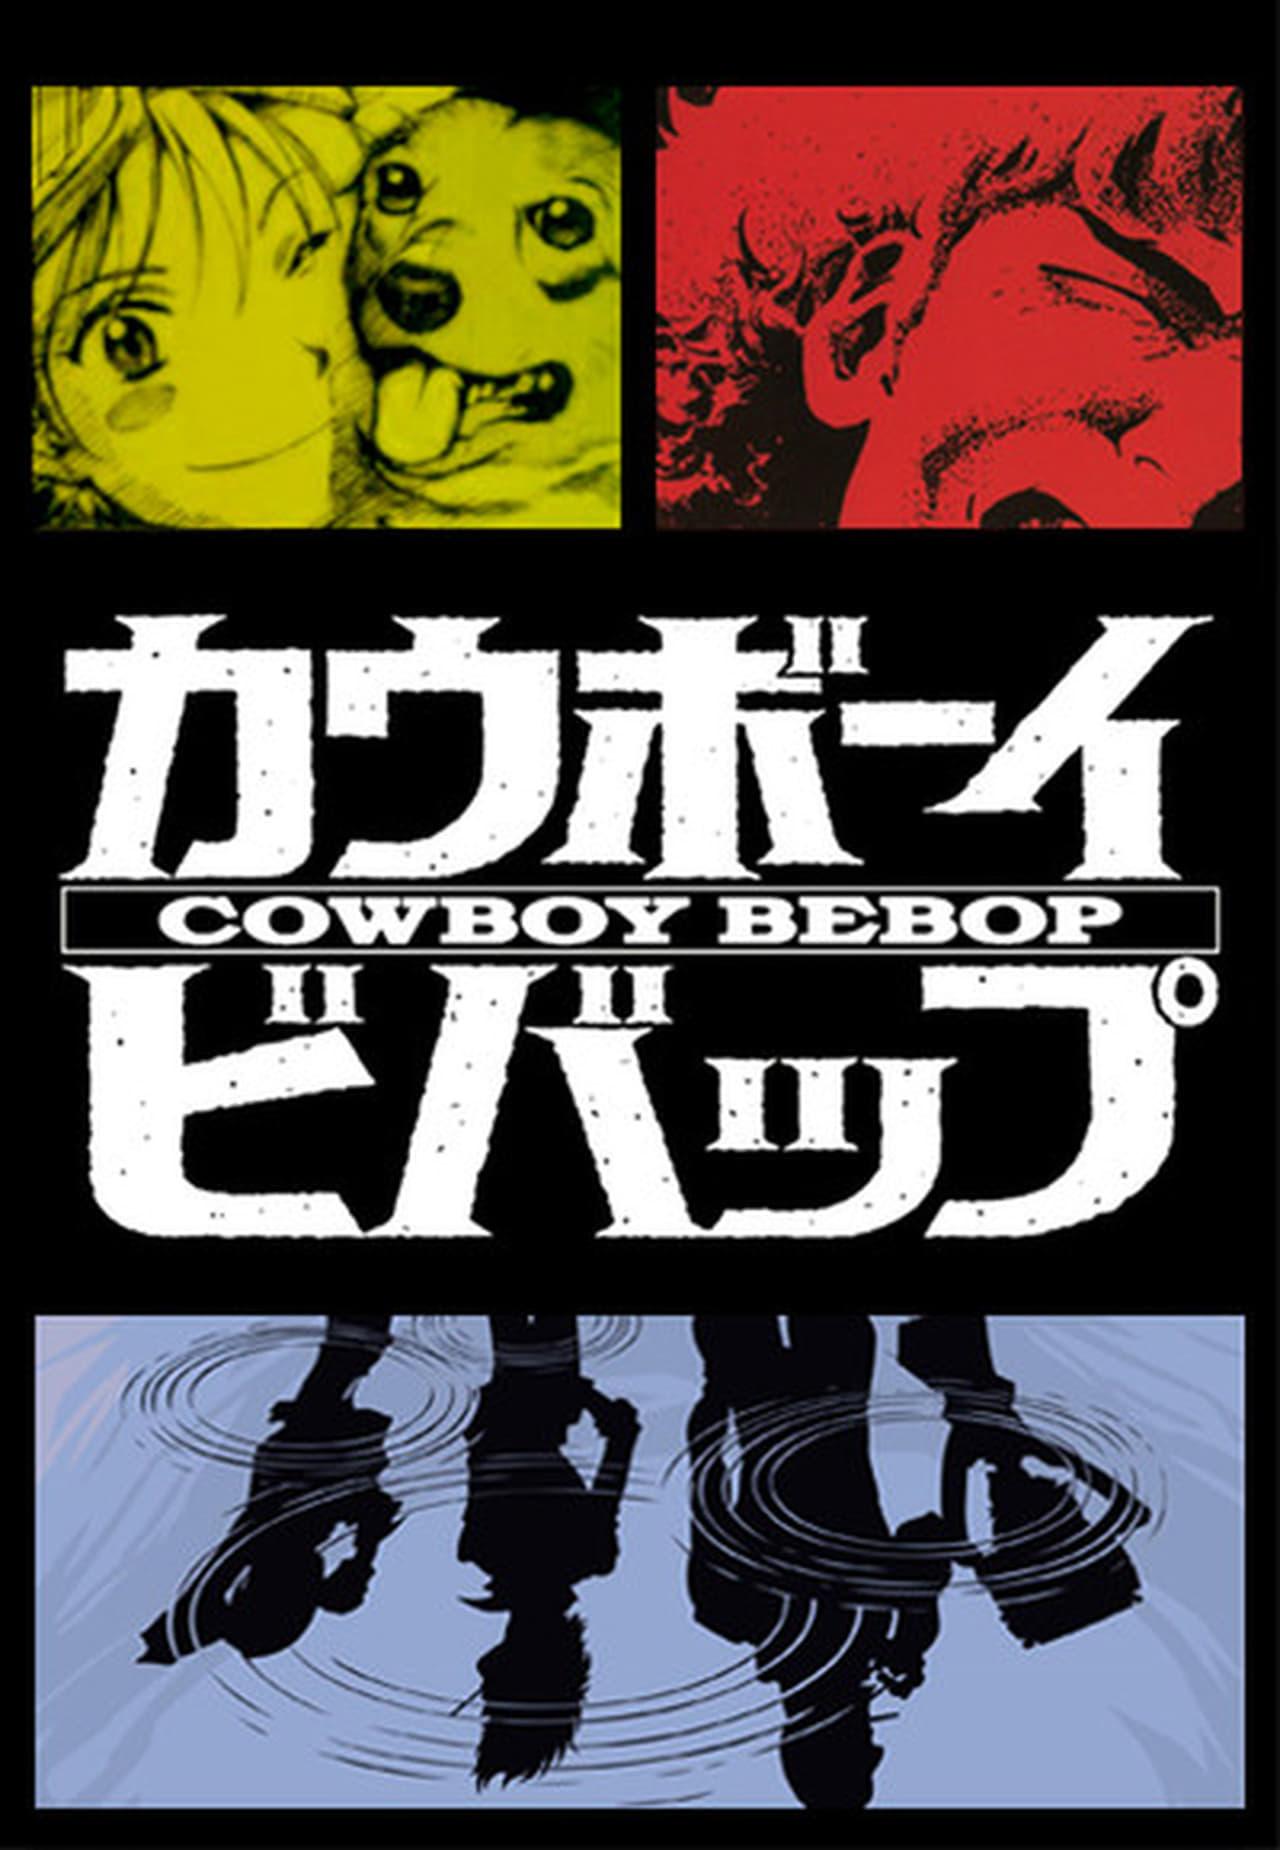 Putlocker Cowboy Bebop Season 0 (2001)